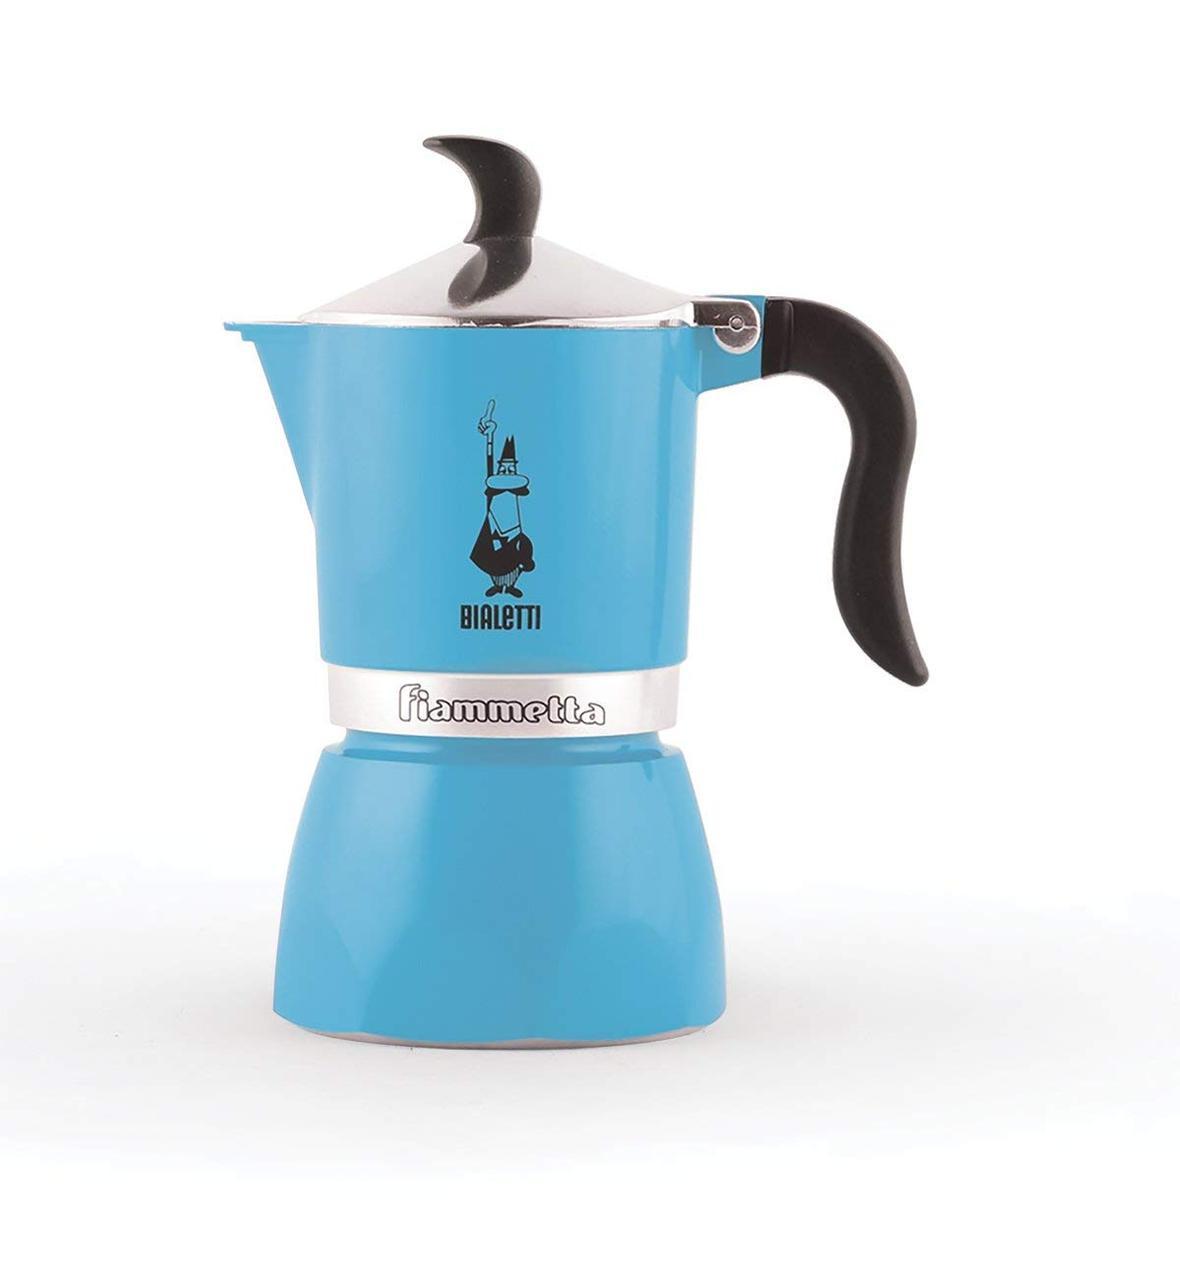 Гейзерная кофеварка Bialetti Fiammetta Blue (3 чашки - 170 мл)